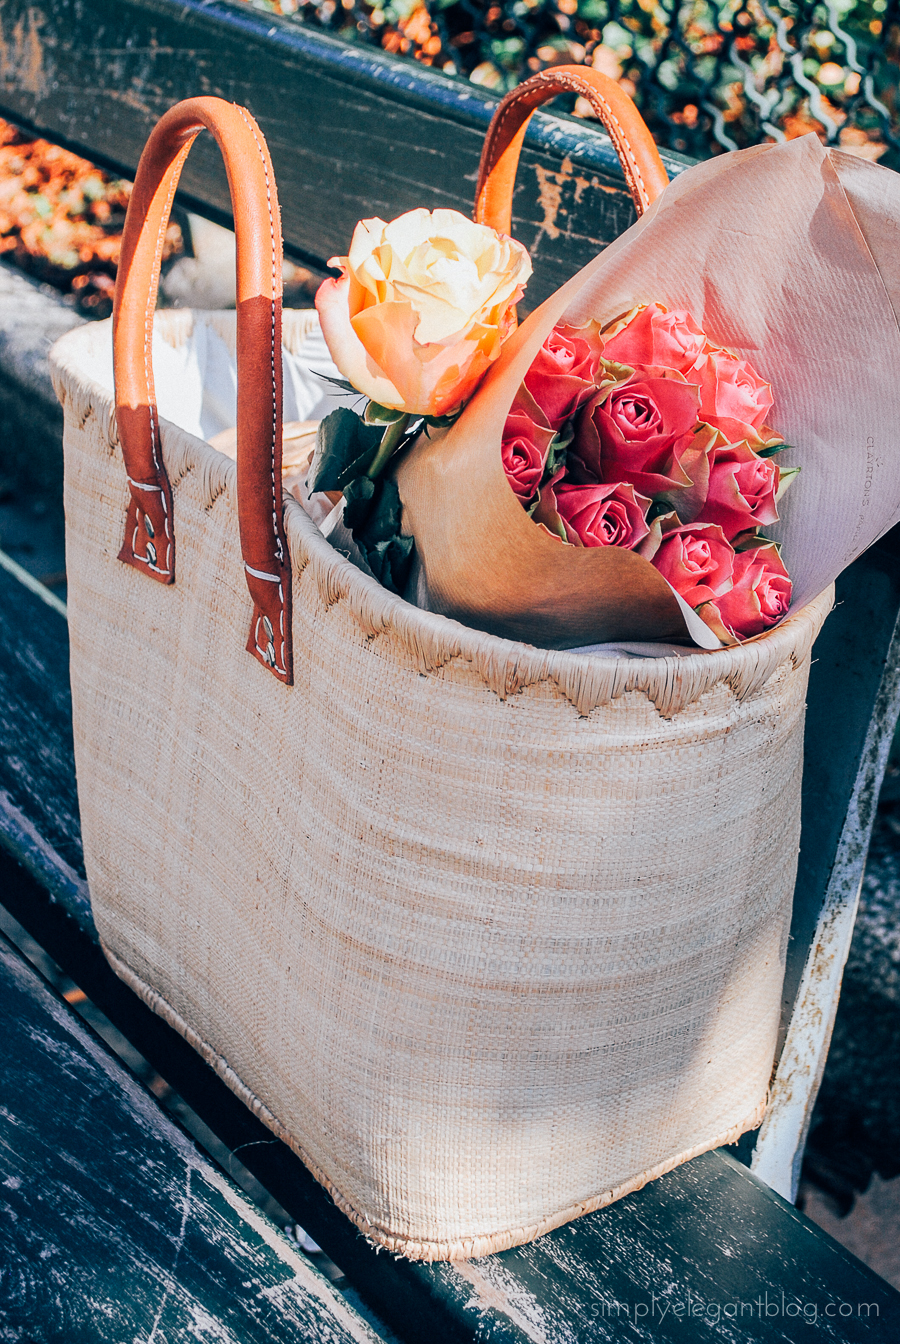 Simply Elegant / Paris Vacation Photographs - Fresh Roses